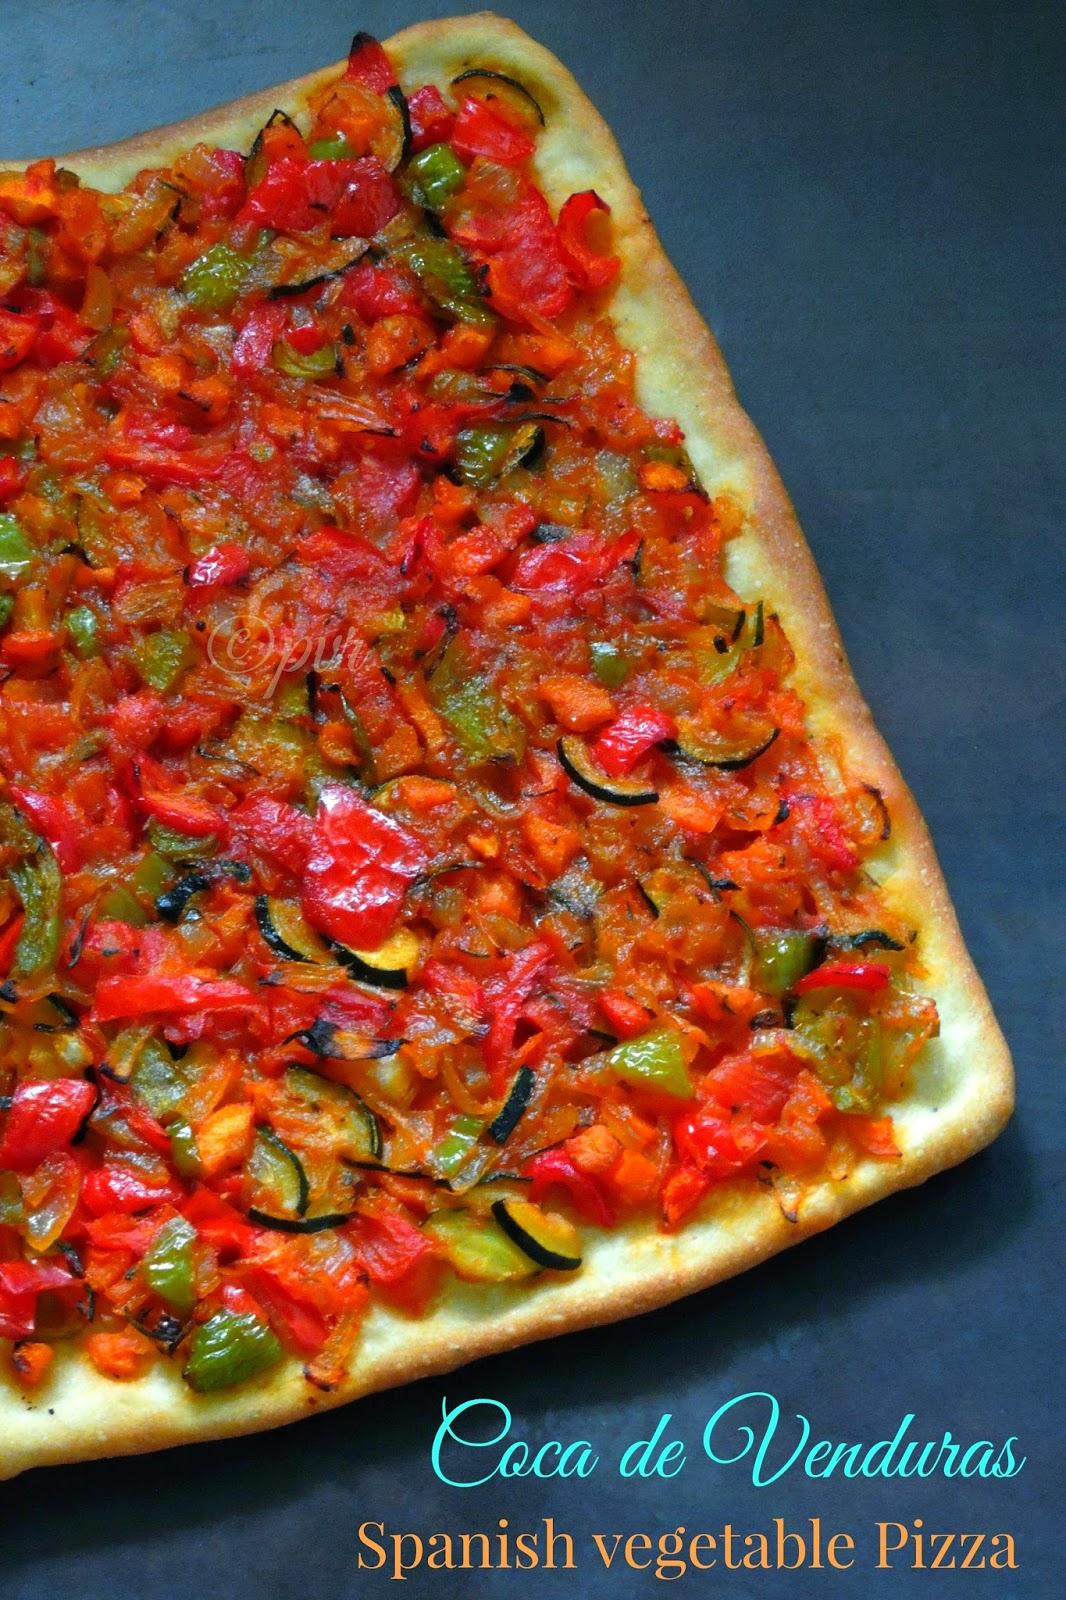 Vegan spanish pizza, coca de venduras, coca vegetable coca catalan